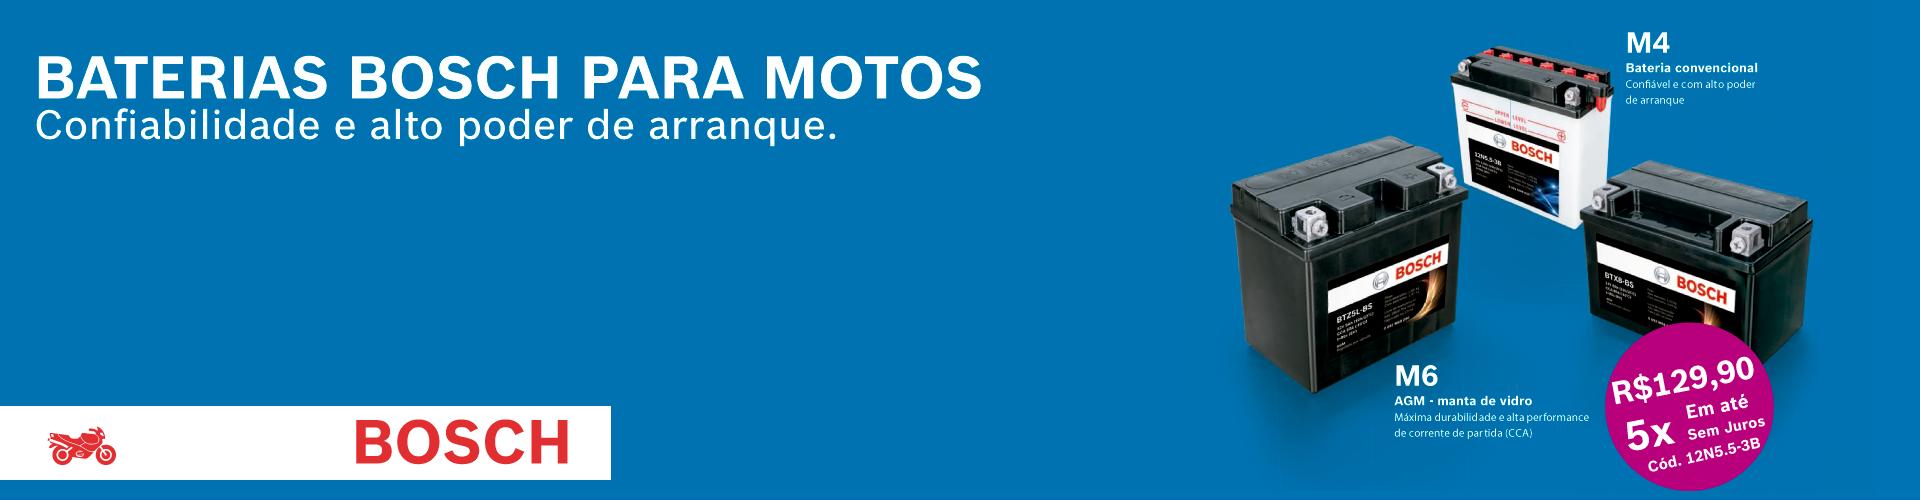 Banner Bosch Motos